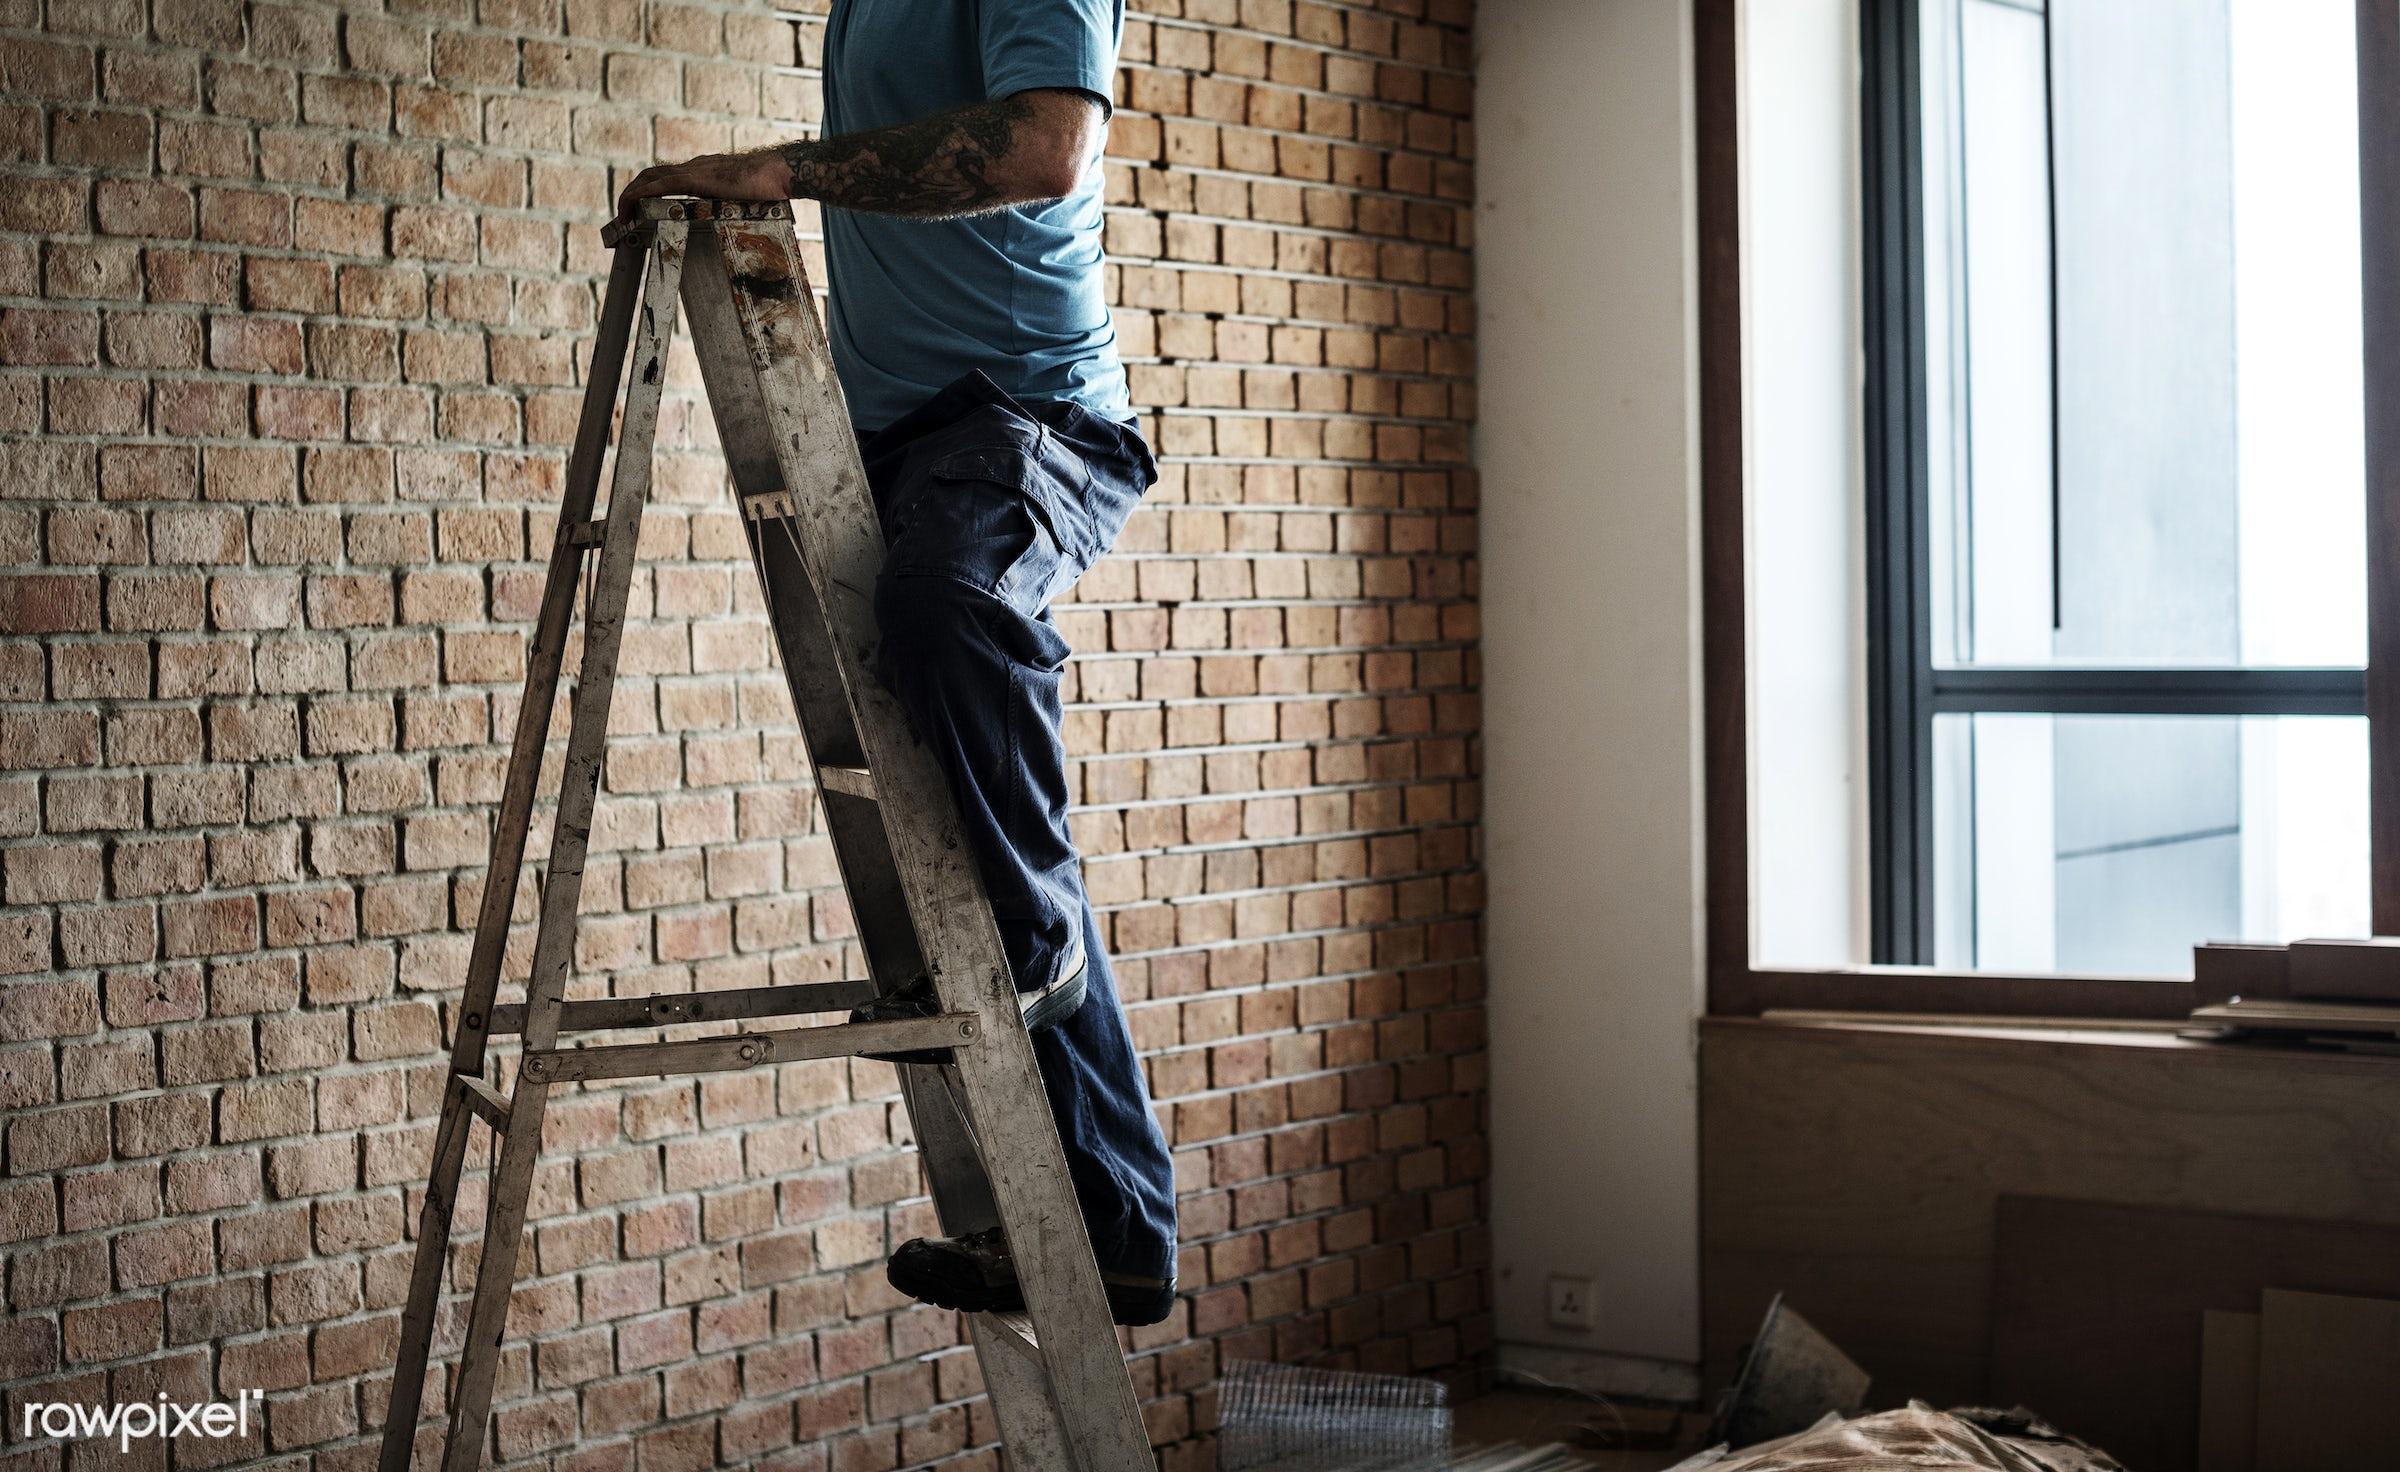 brick, equipment, build, tools, materials, handyman, craftsman, worker, repair, workman, working, tattoo, ladder, renovating...